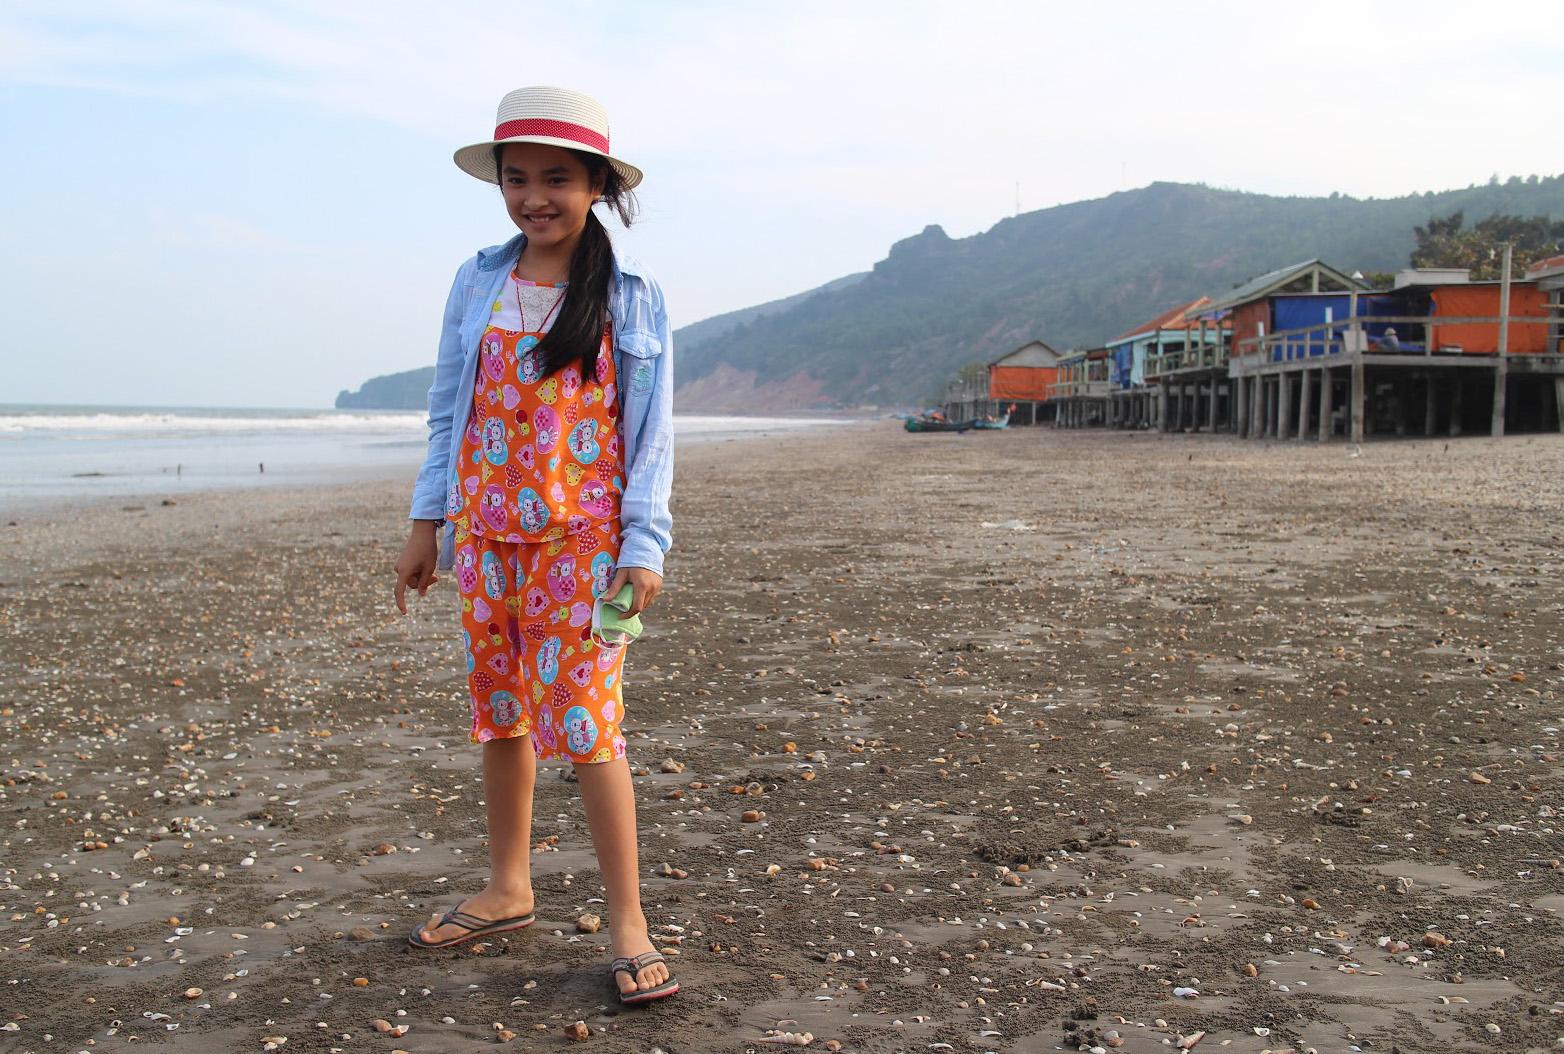 Duara_village_quynh_nqoc_beach.jpg